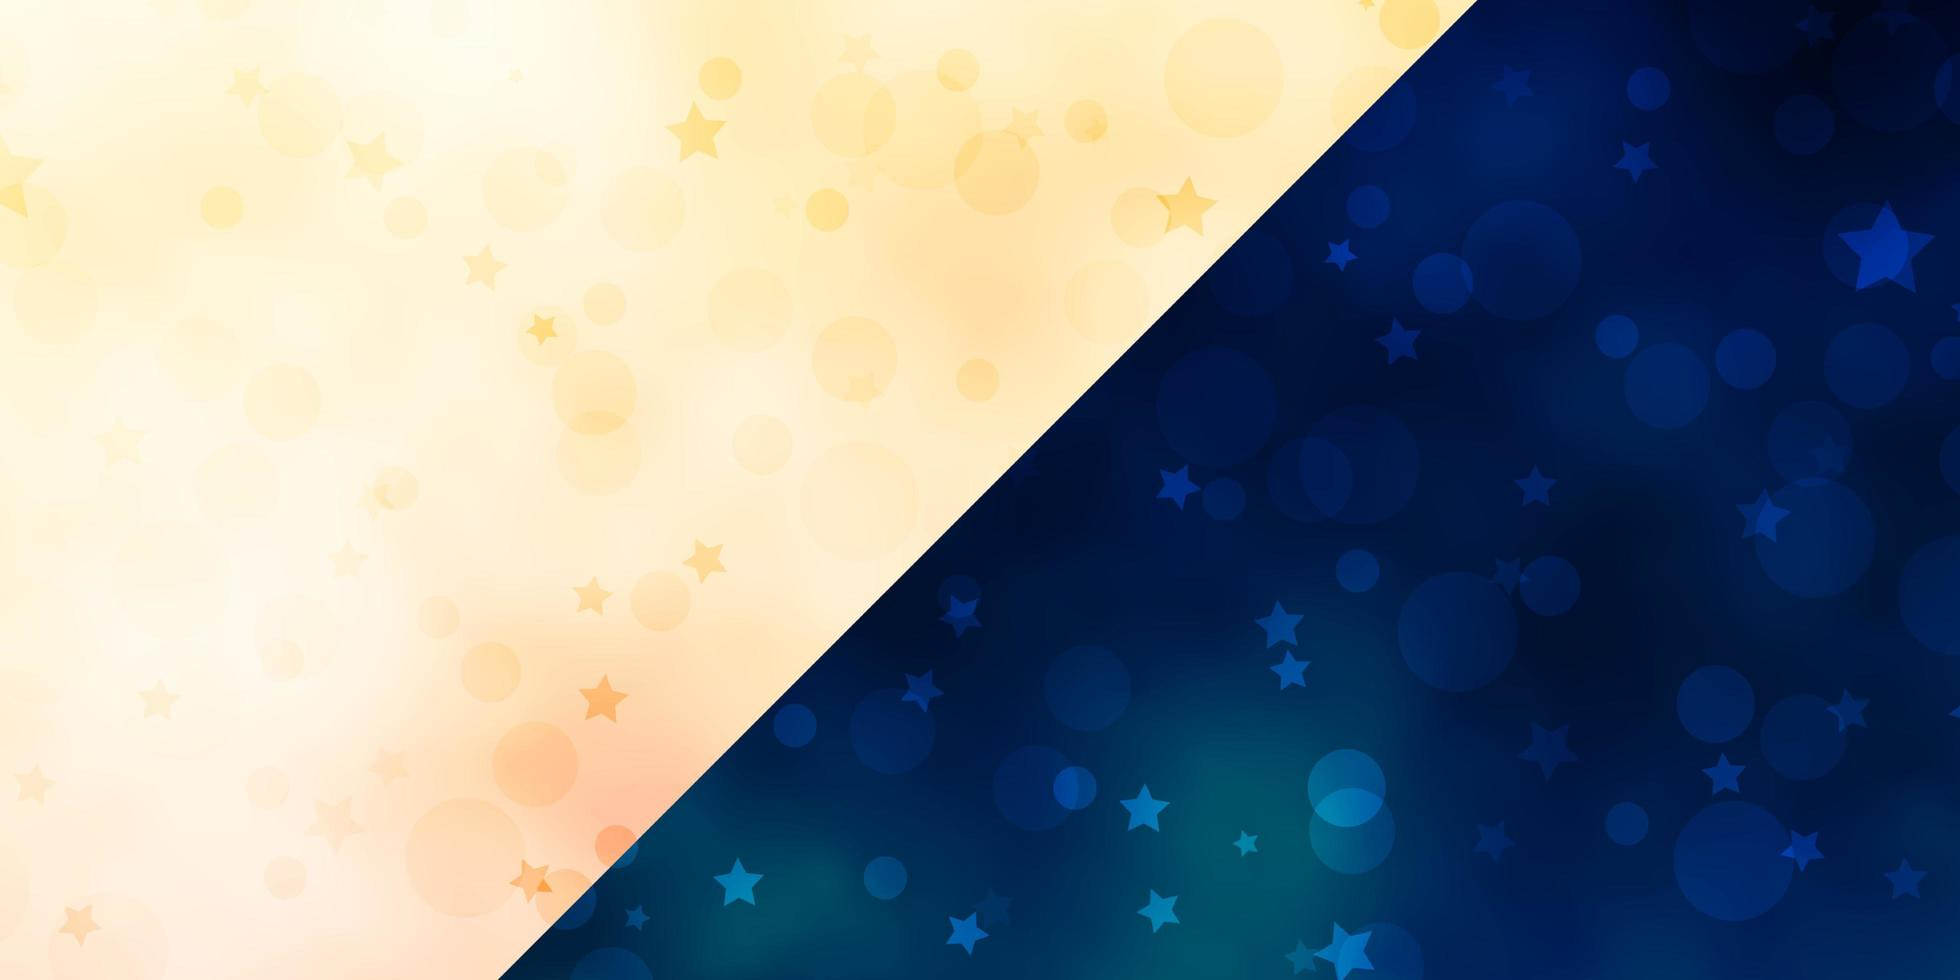 Vector backdrop with circles, stars.